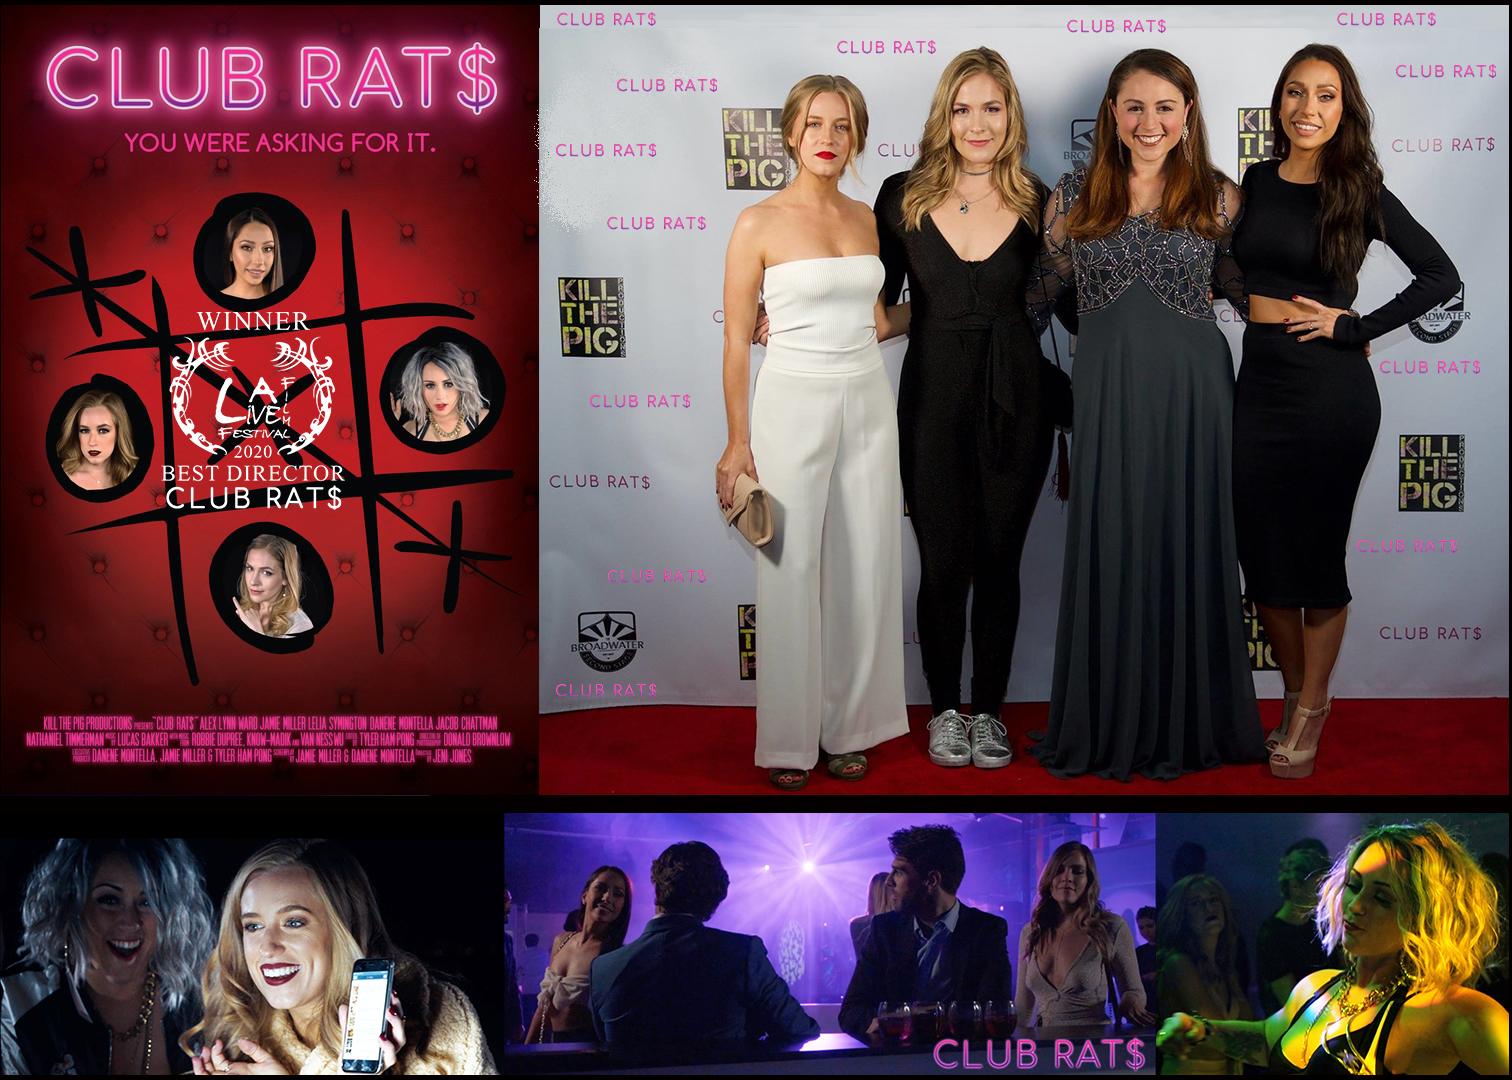 club rat$